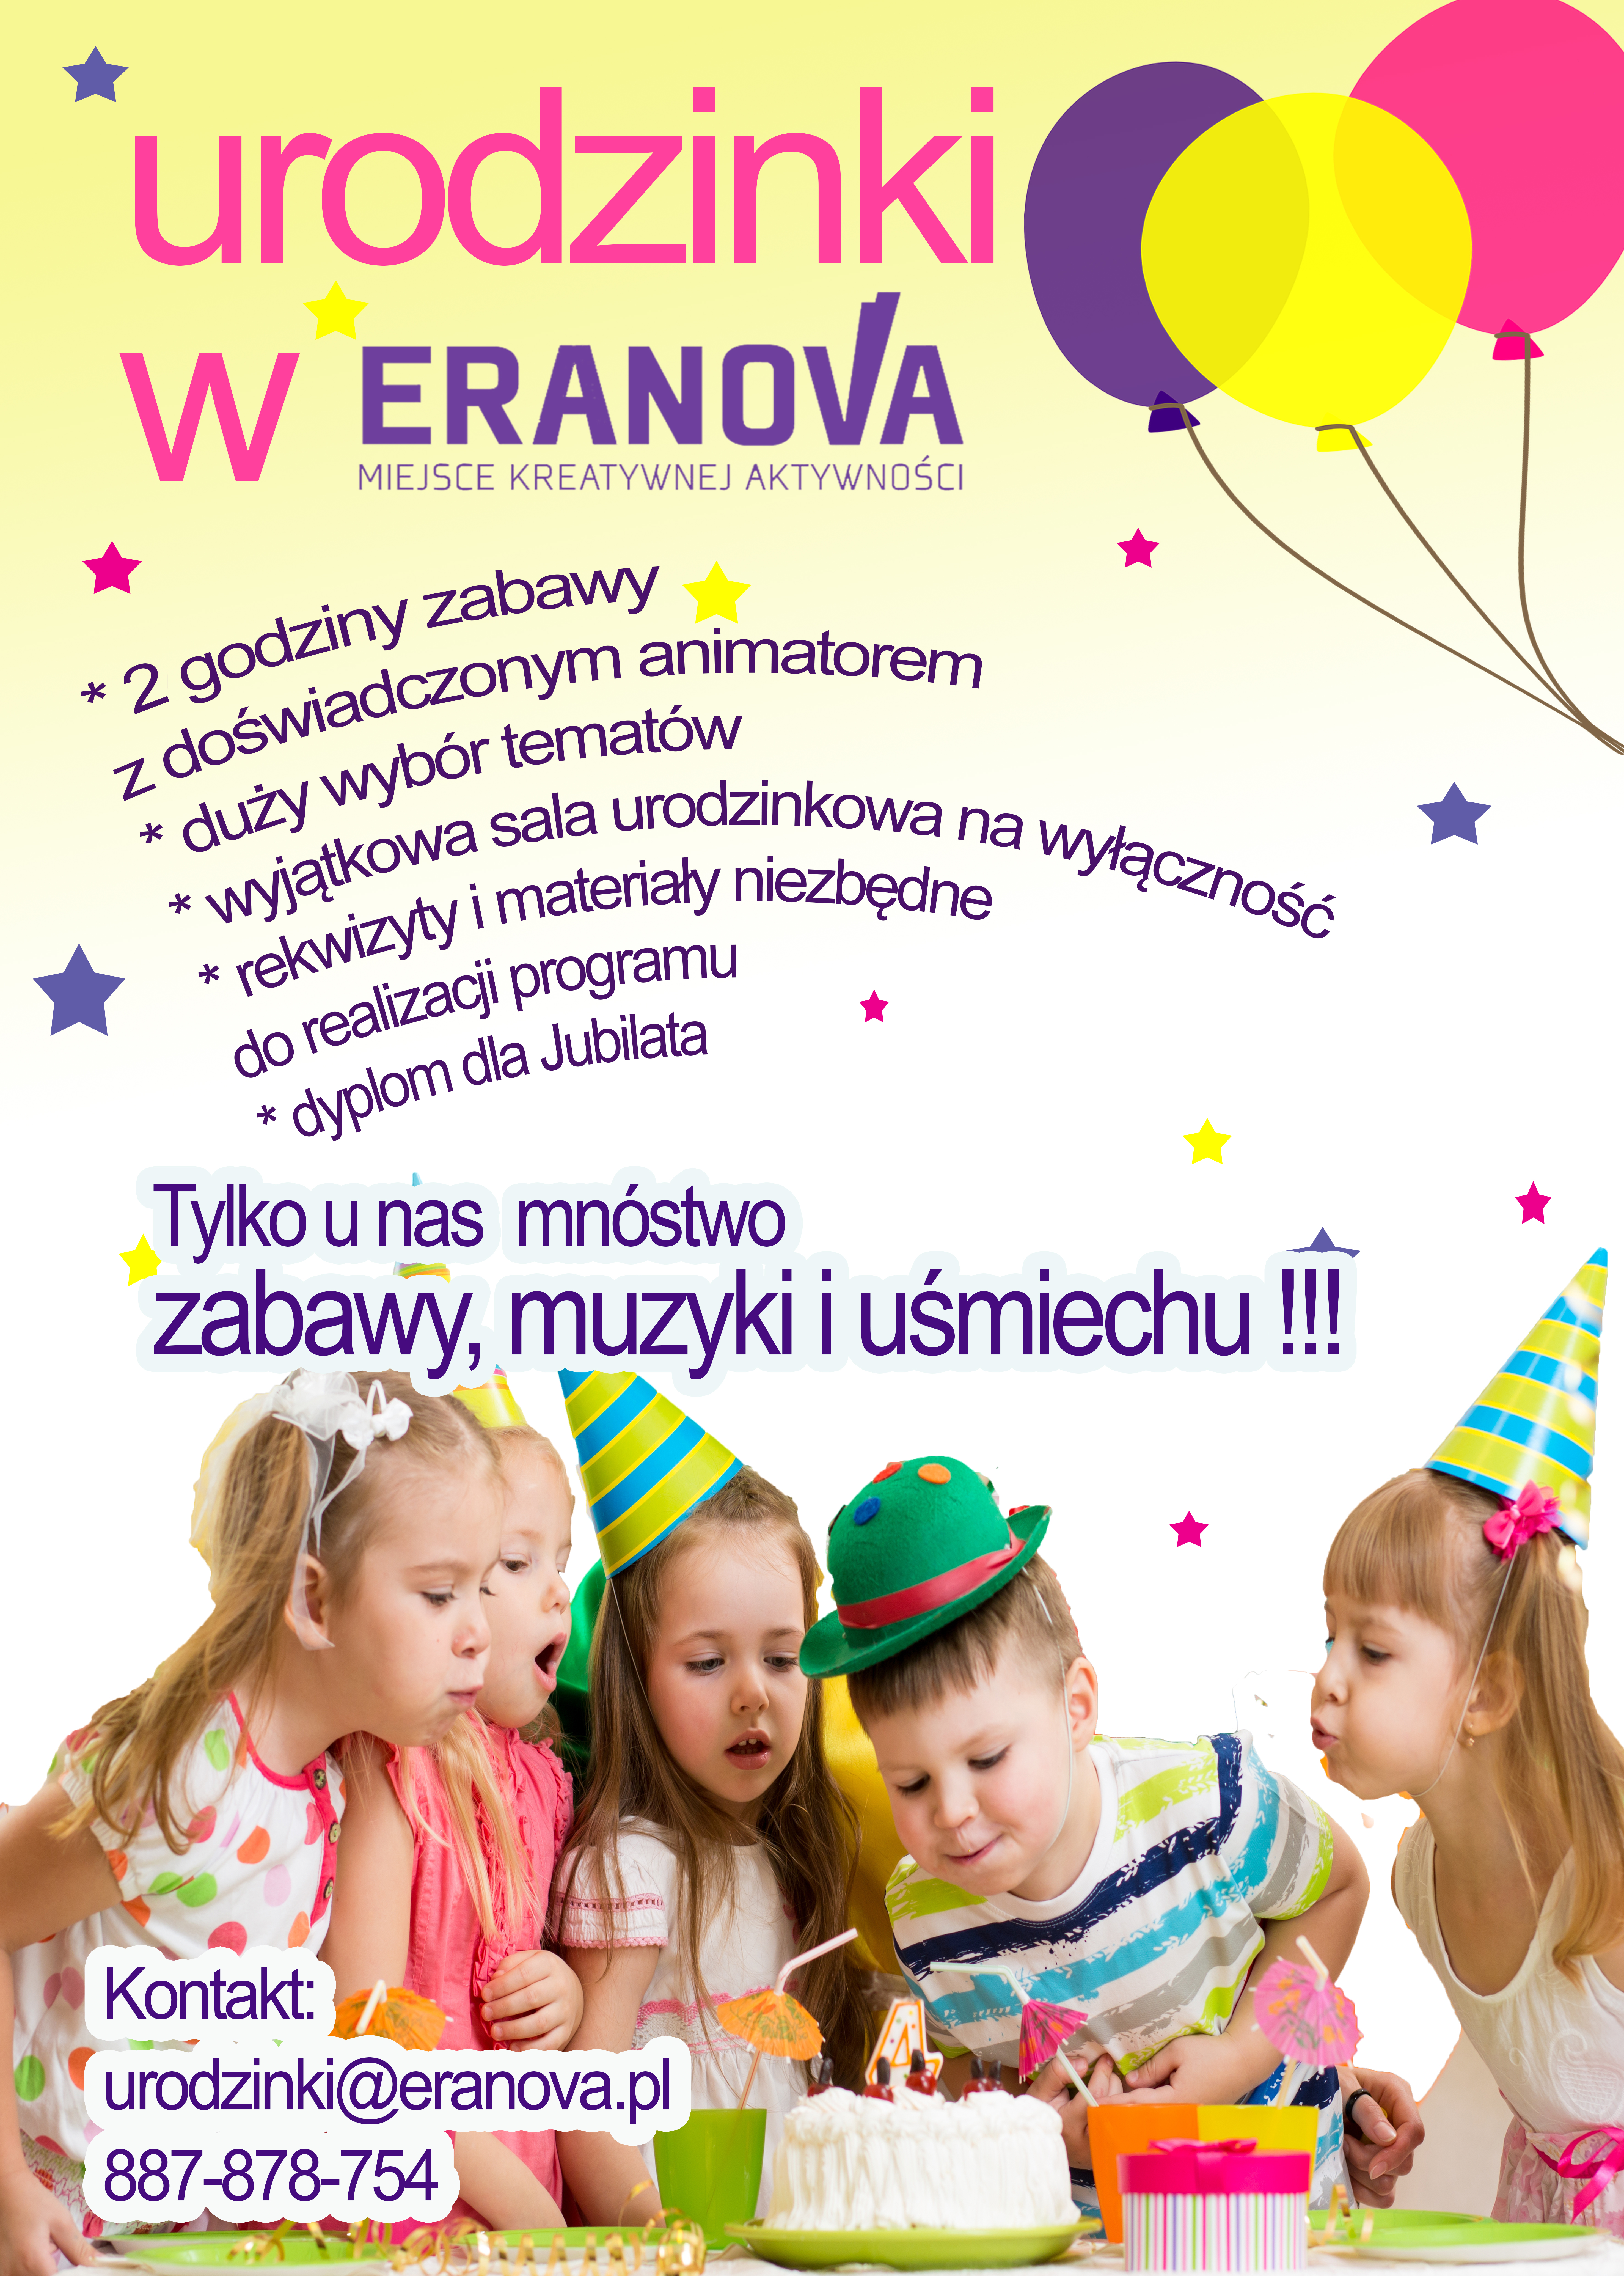 http://m.eranova.pl/2018/07/orig/plakat-urodzinki-2660.jpg